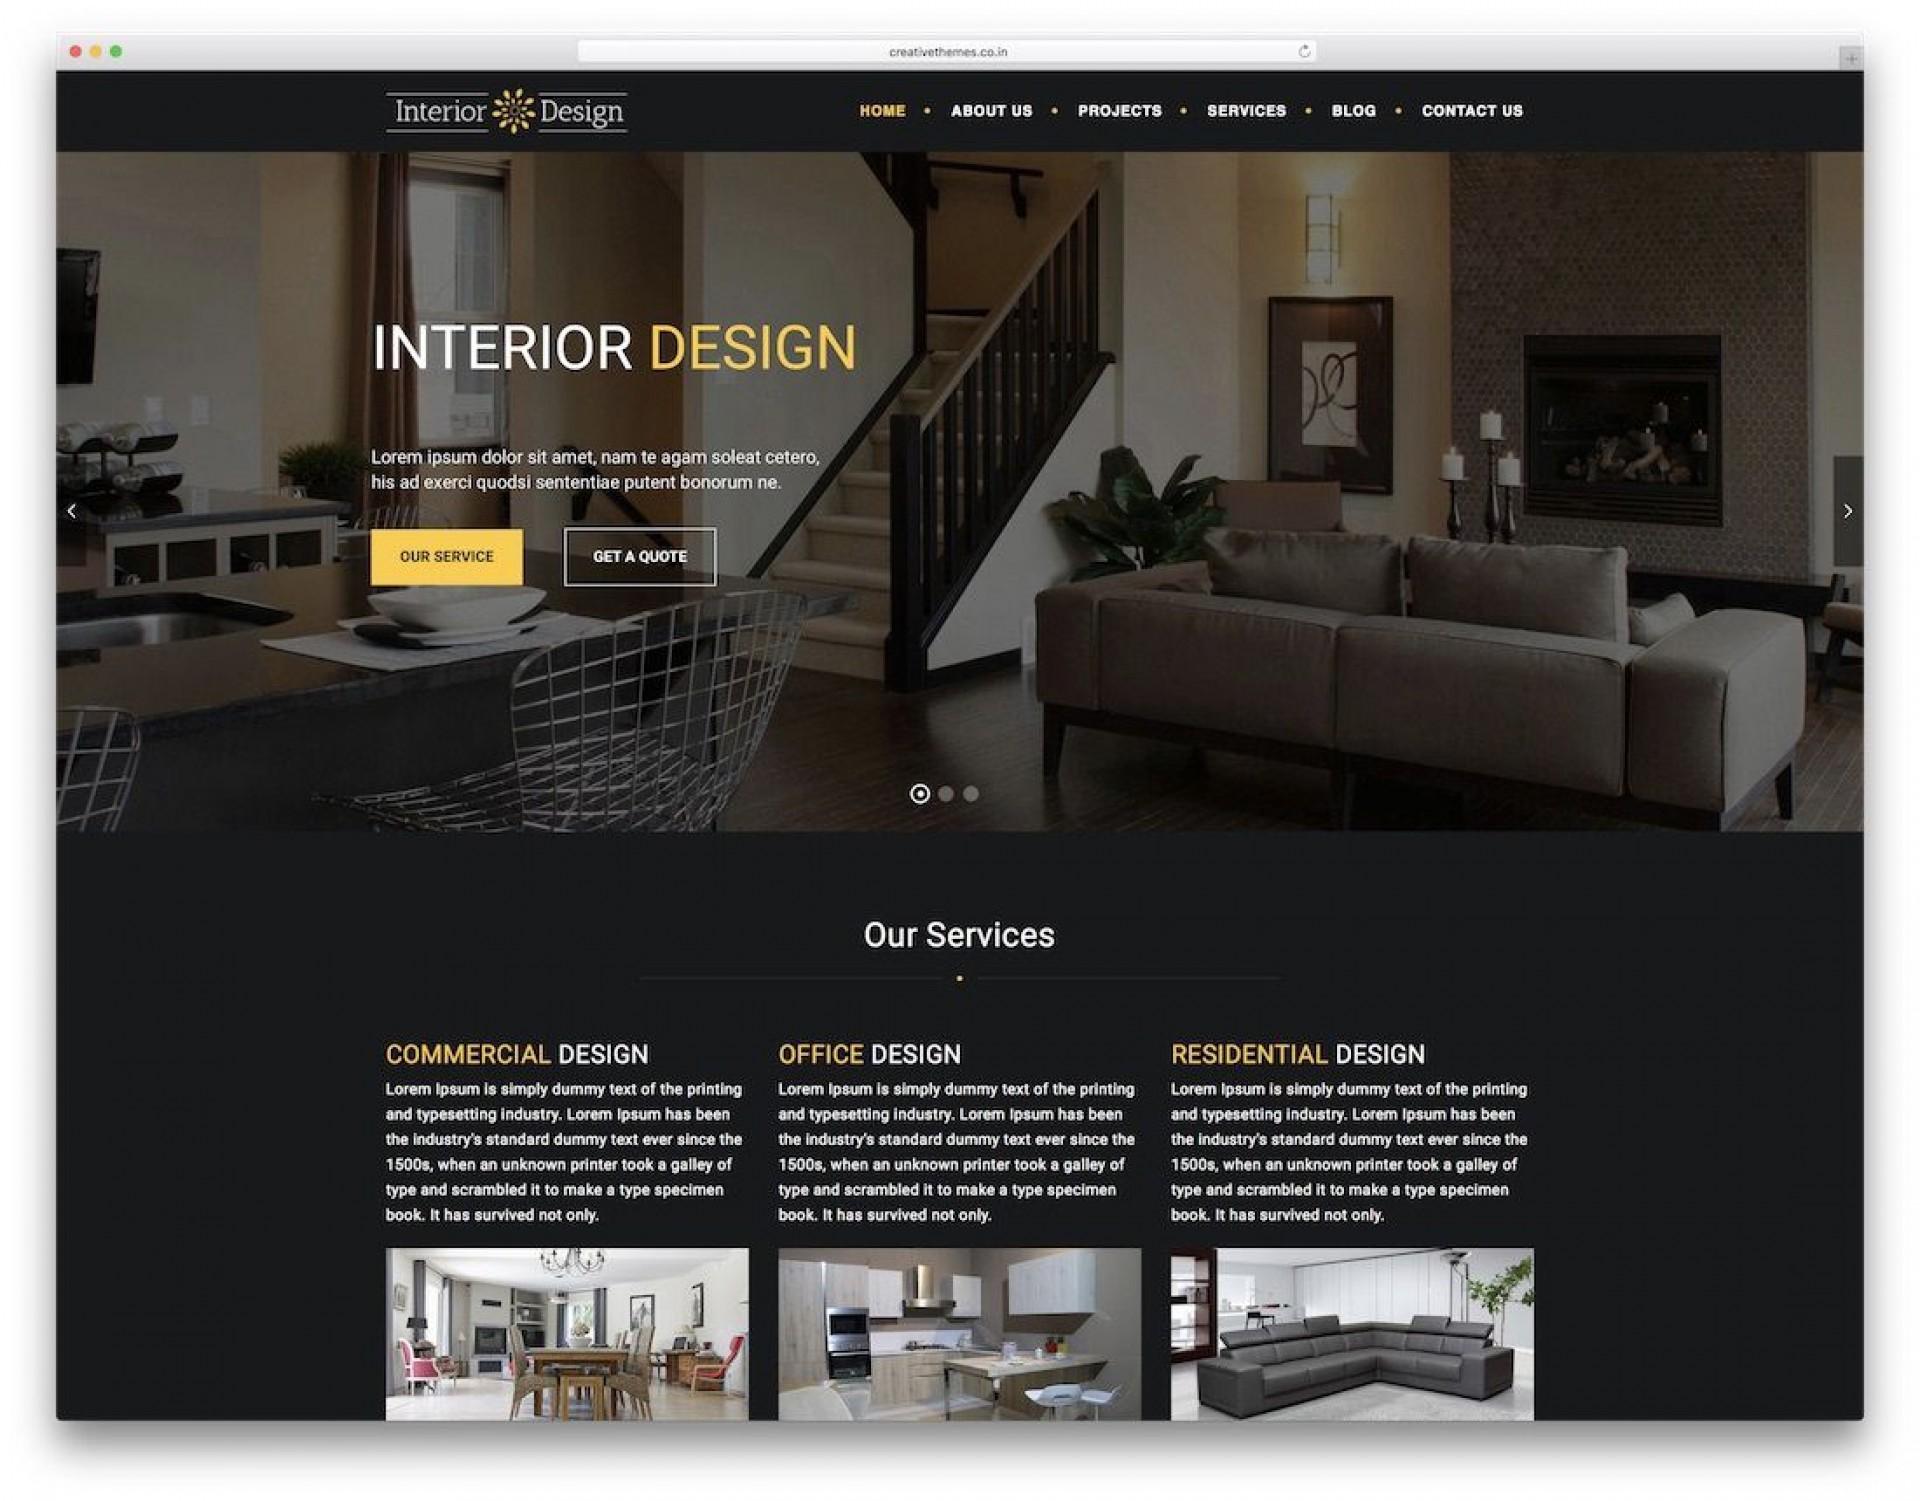 008 Sensational Interior Design Html Template Free Download Image 1920